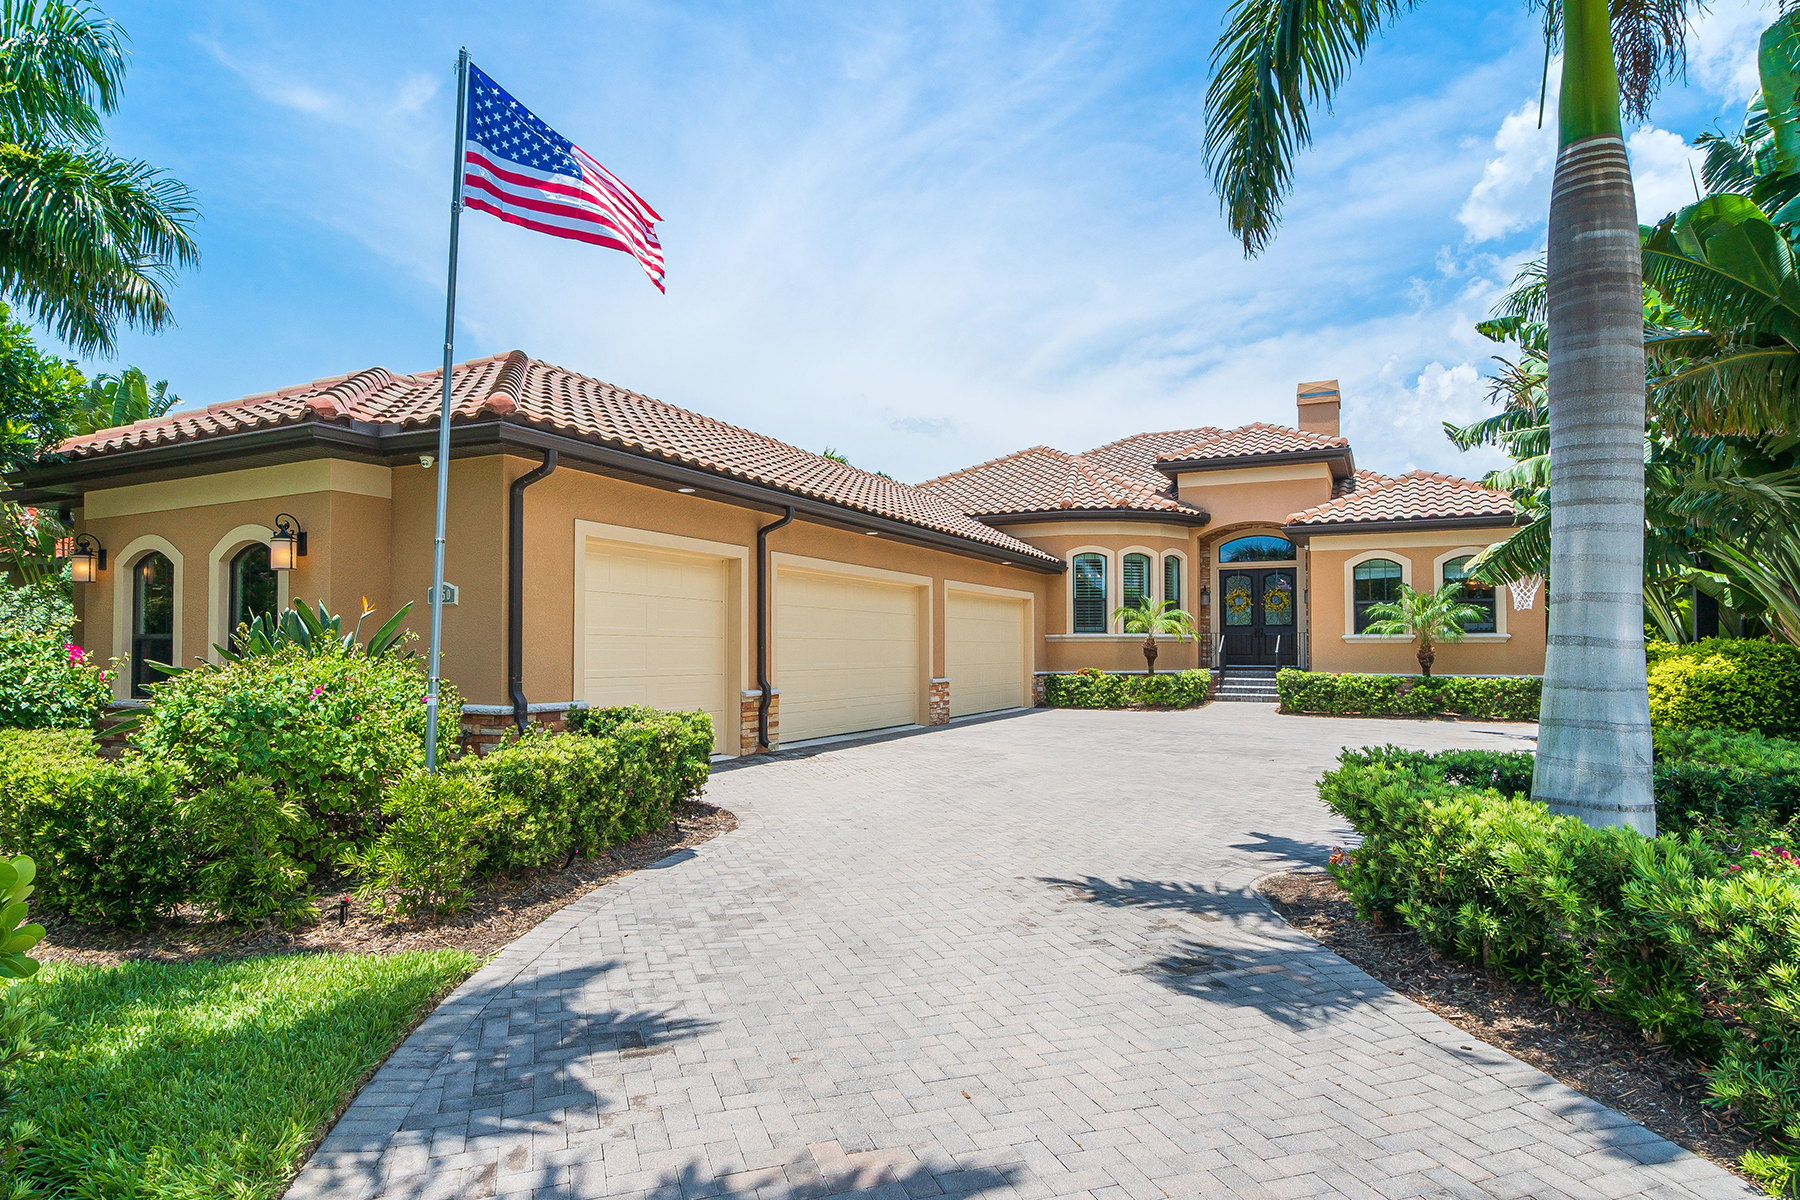 Single Family Homes for Active at CASEY KEY ESTATES 1050 Gulf Winds Way Nokomis, Florida 34275 United States